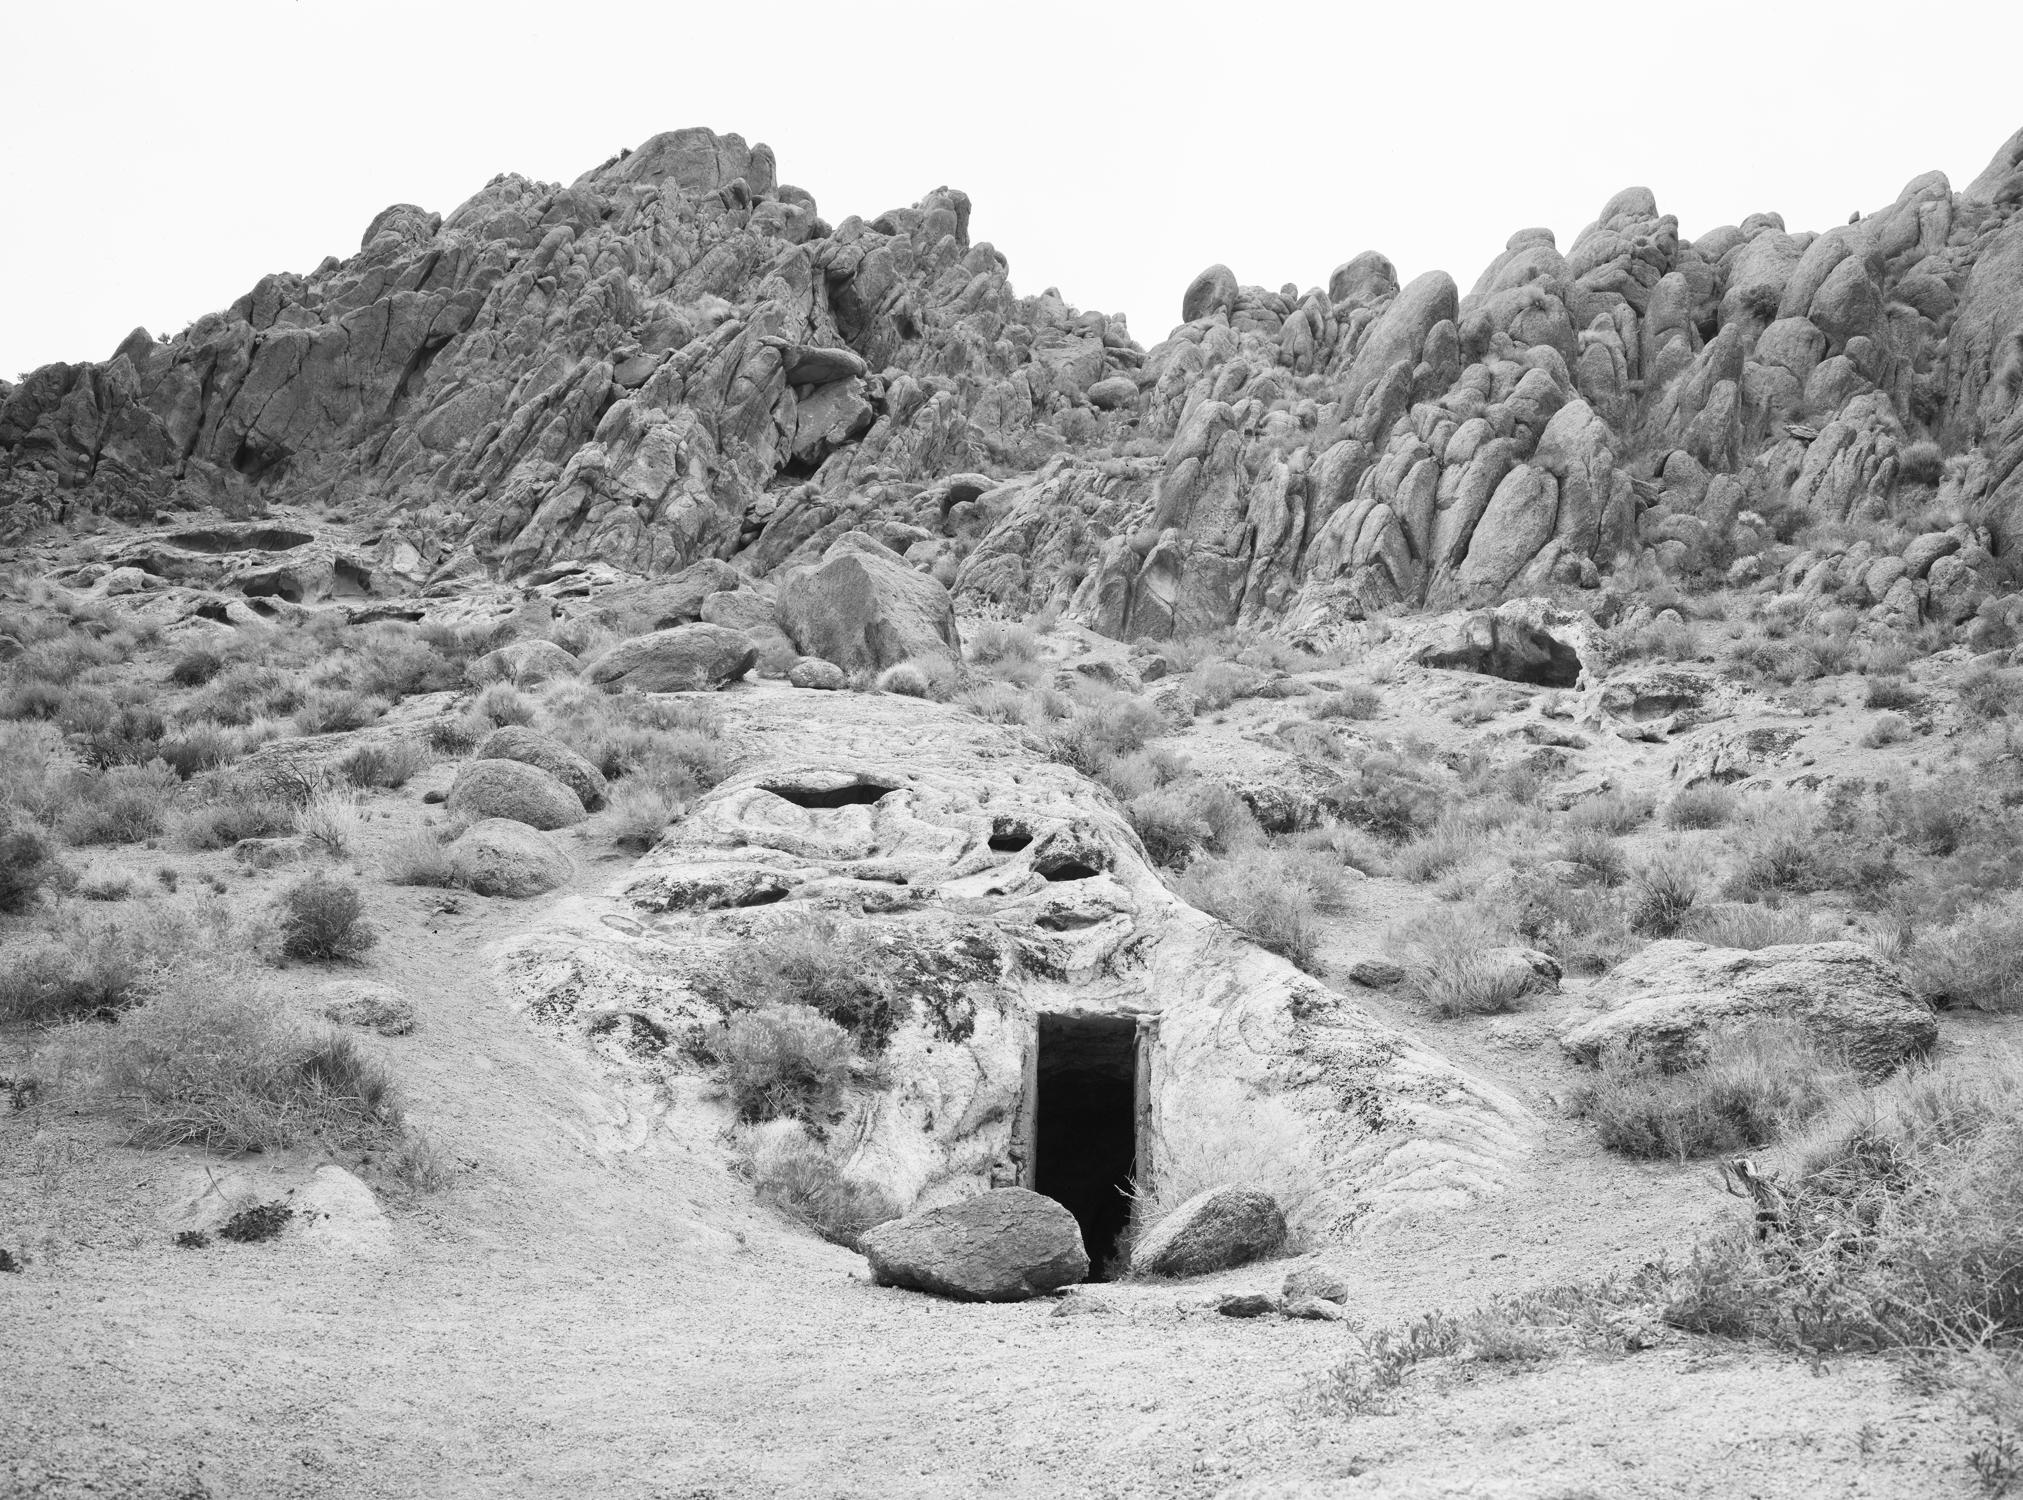 Lone Pine, California 2010